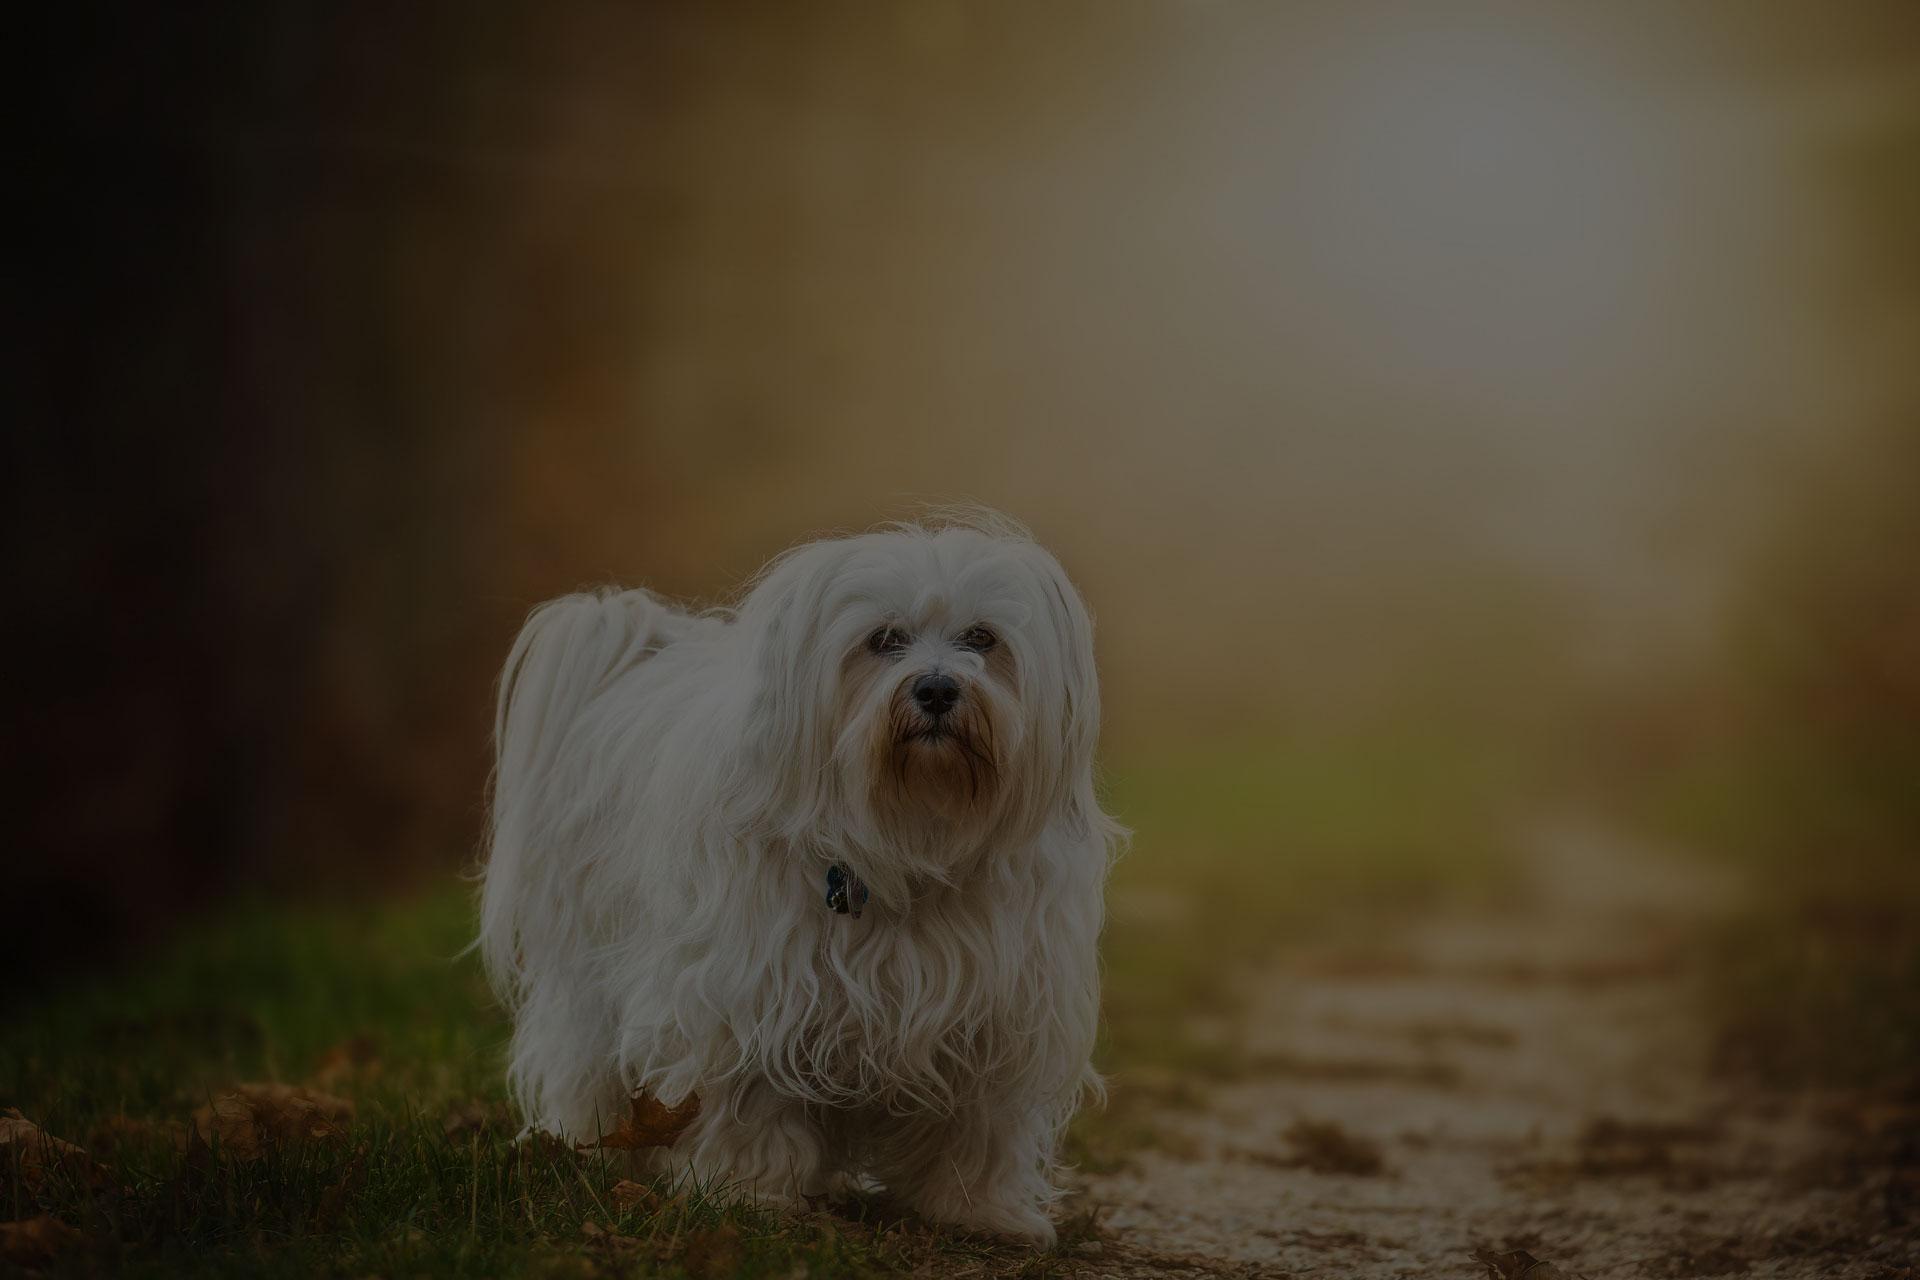 Shih tzu dog on grass, outdoor in sunset